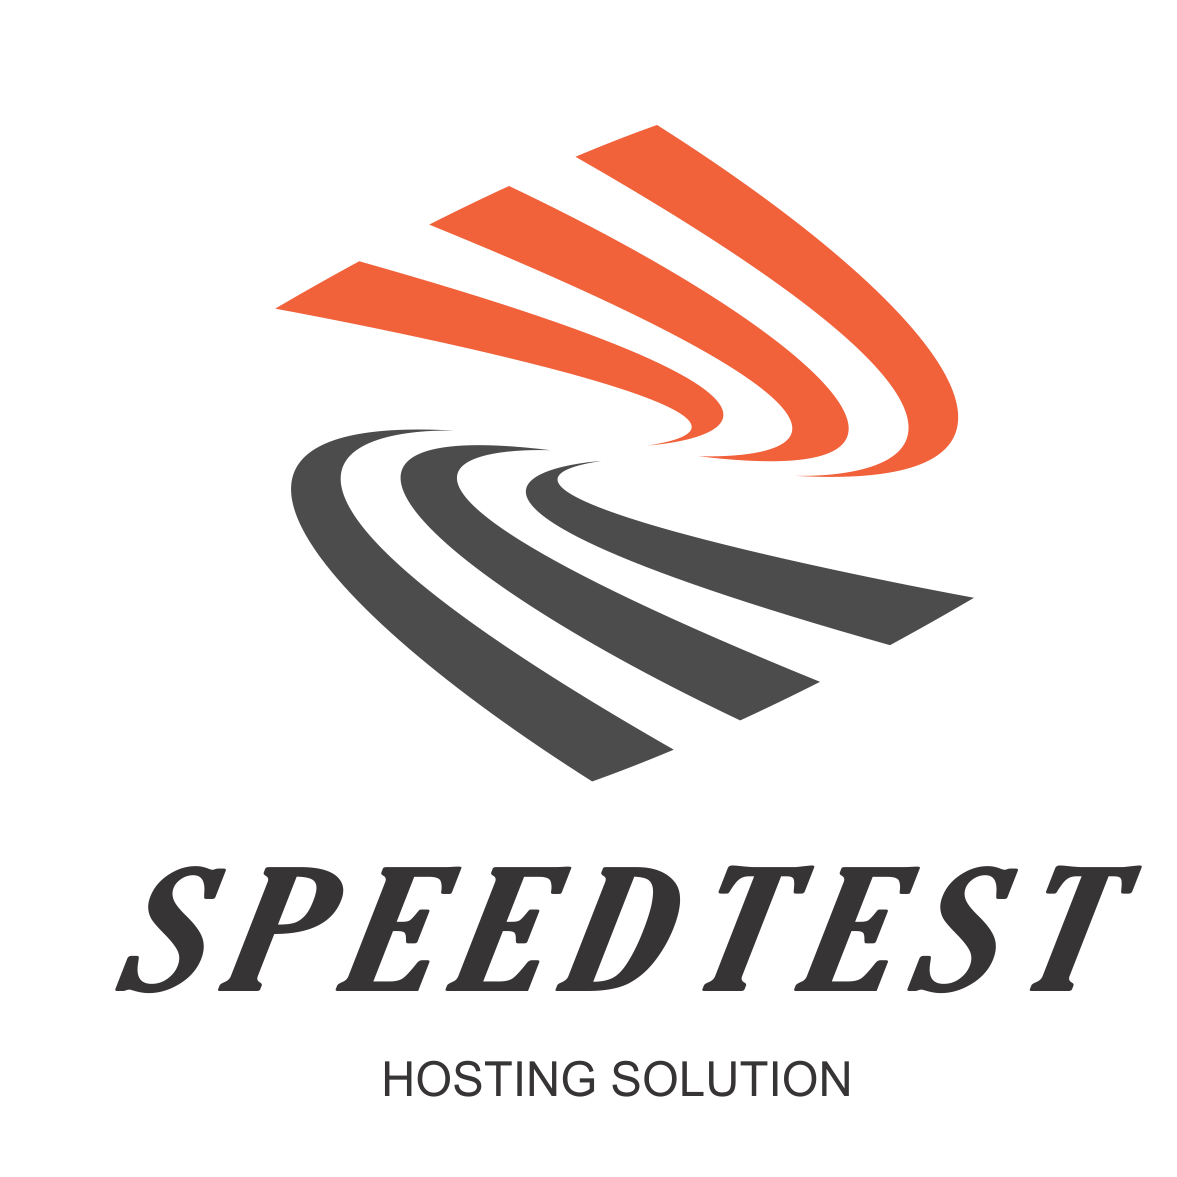 SpeedTestMK